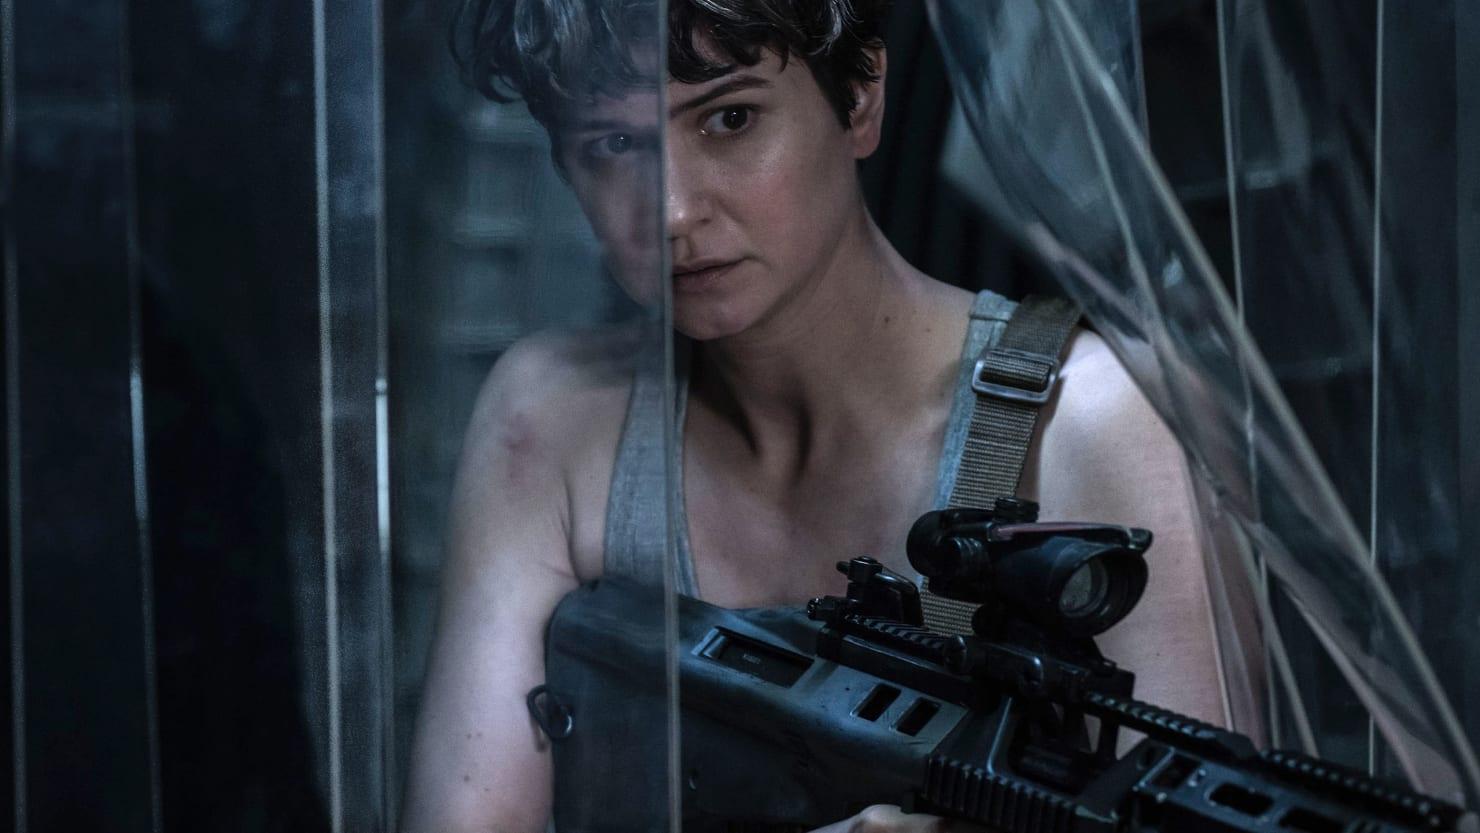 Katherine Waterston Channels Ripley In New Alien Covenant Photo